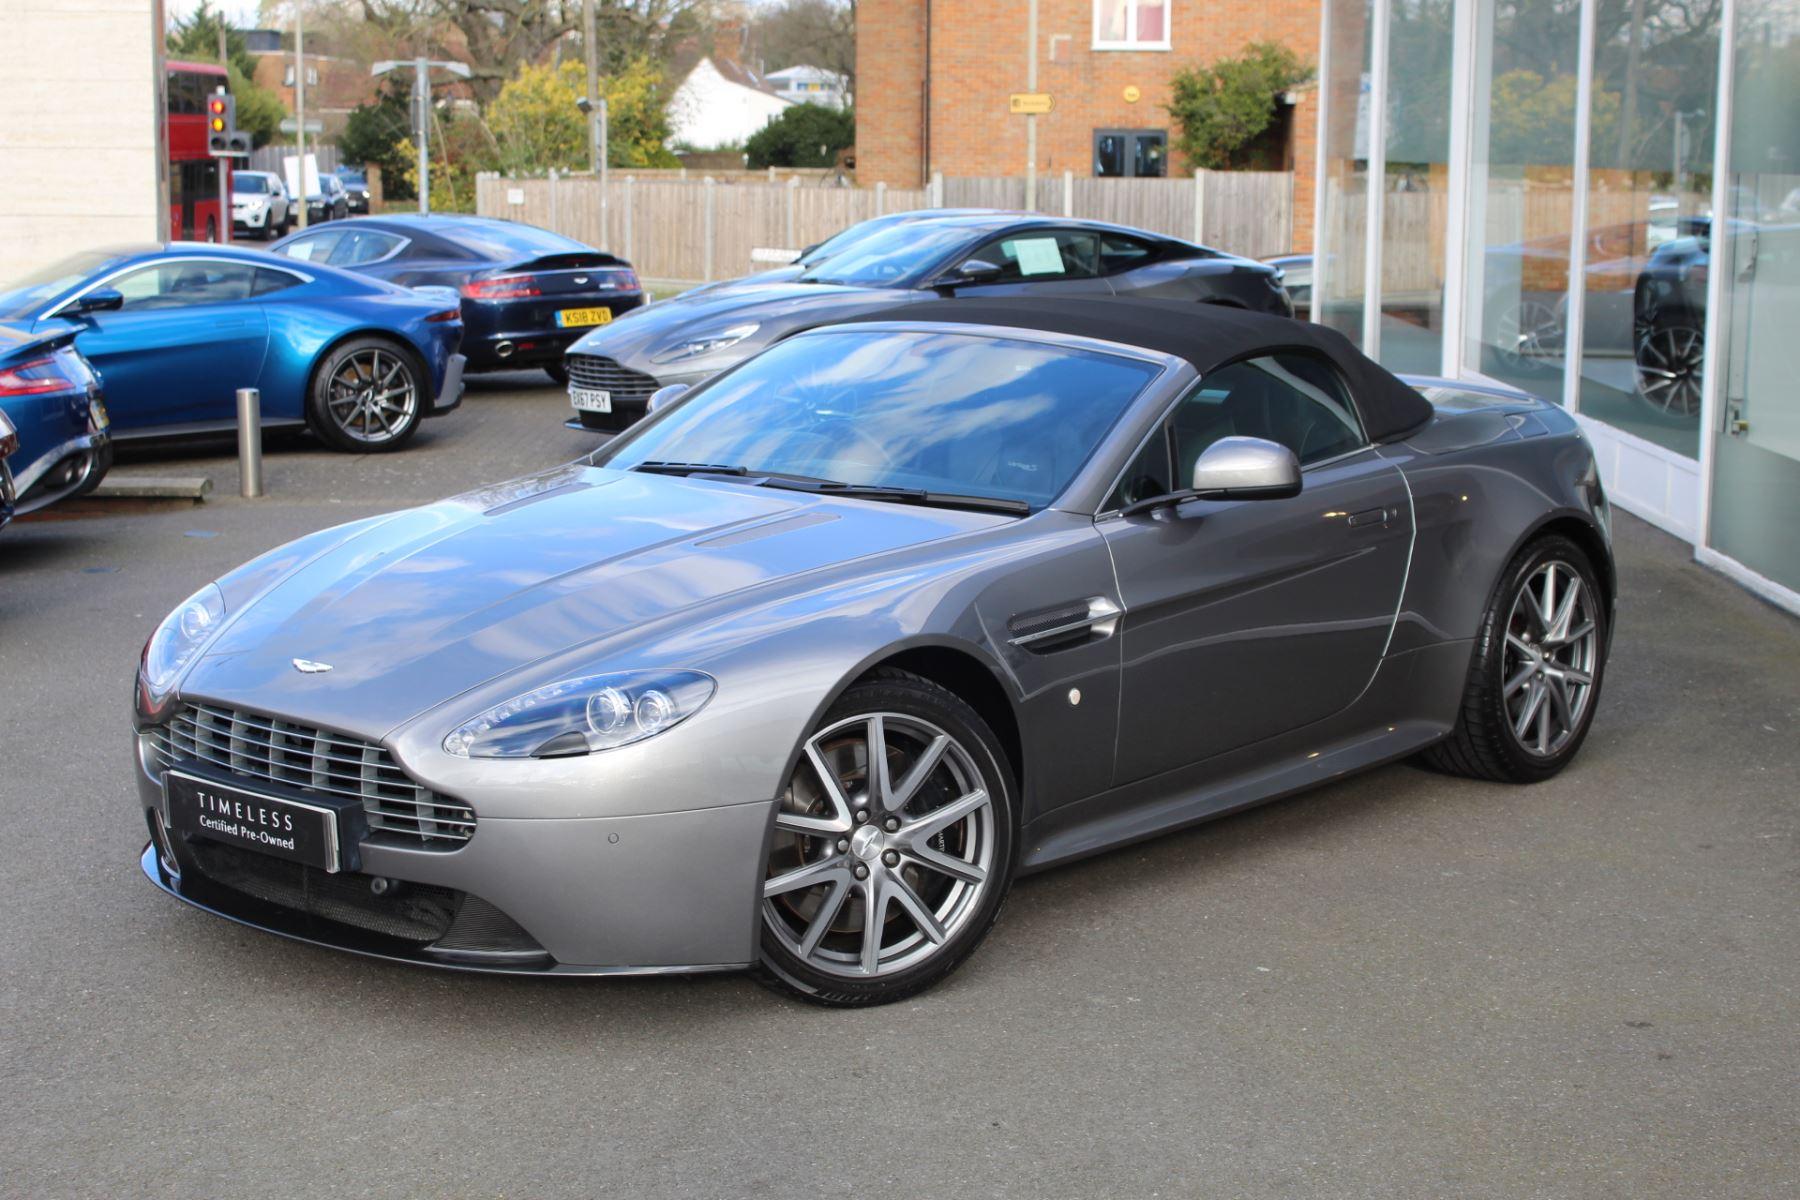 Aston Martin V8 Vantage S Roadster S 2dr Sportshift  Rare S Model  image 2